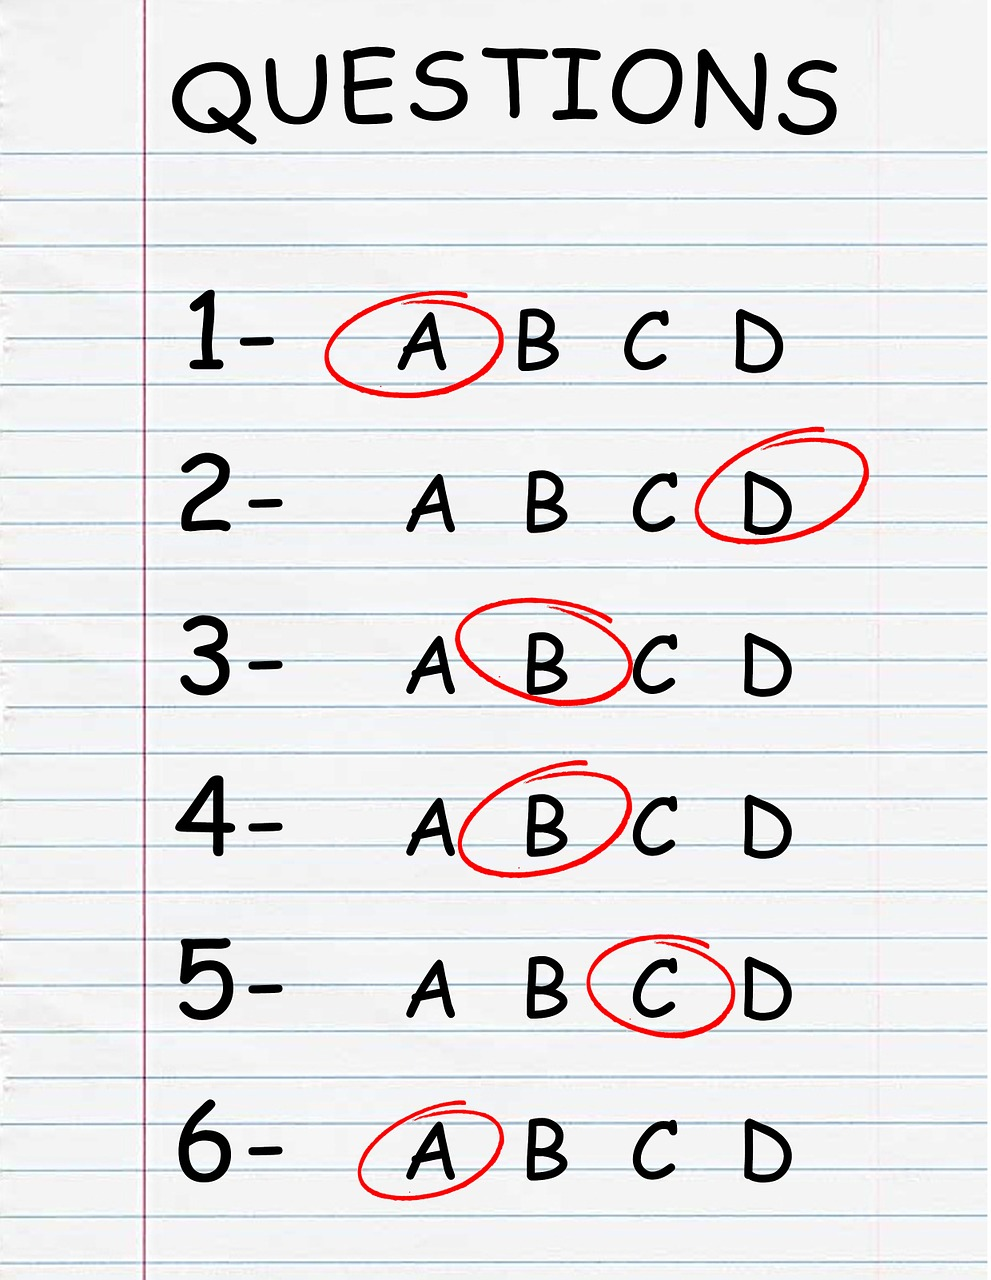 Soal Jawab Uts Pts 2 Seni Budaya Smp Mts Kelas 8 Kurikulum 2013 Informasiguru Com